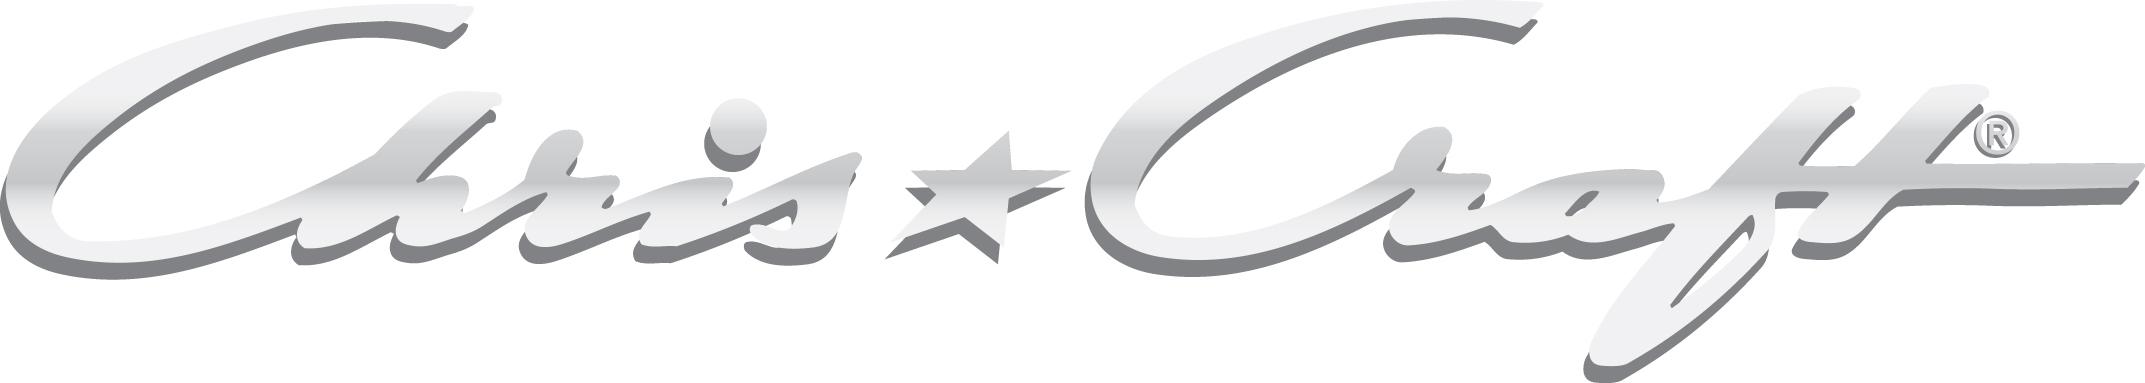 Chris-Craft logo